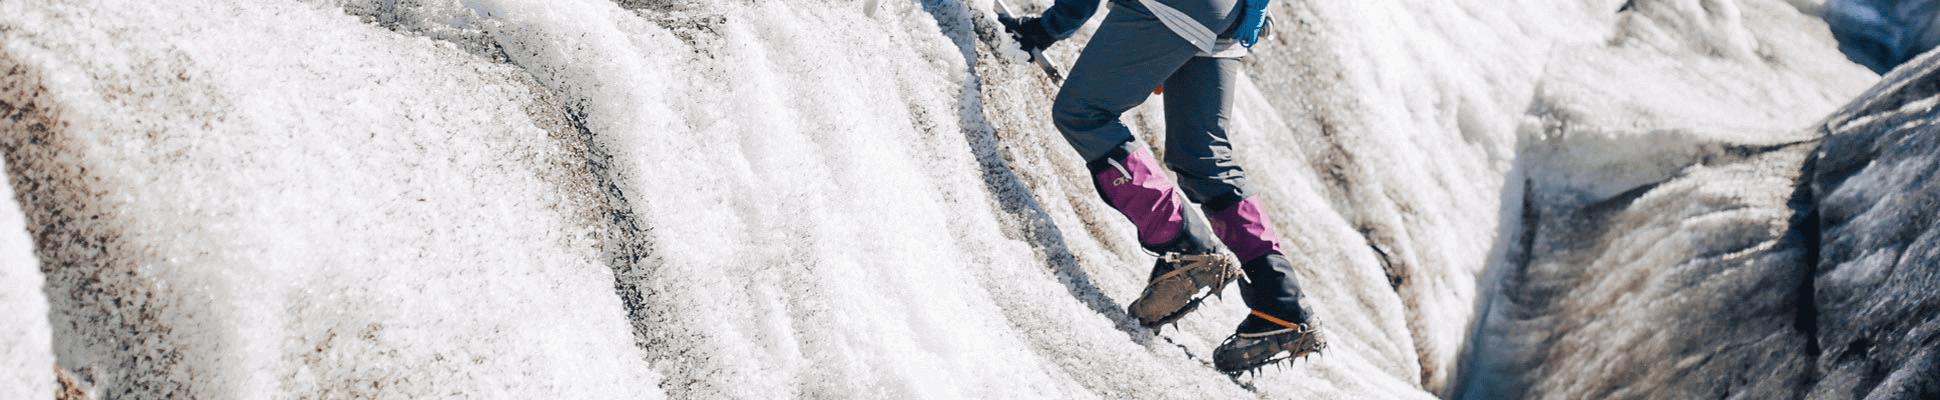 Mountaineering Gaiters